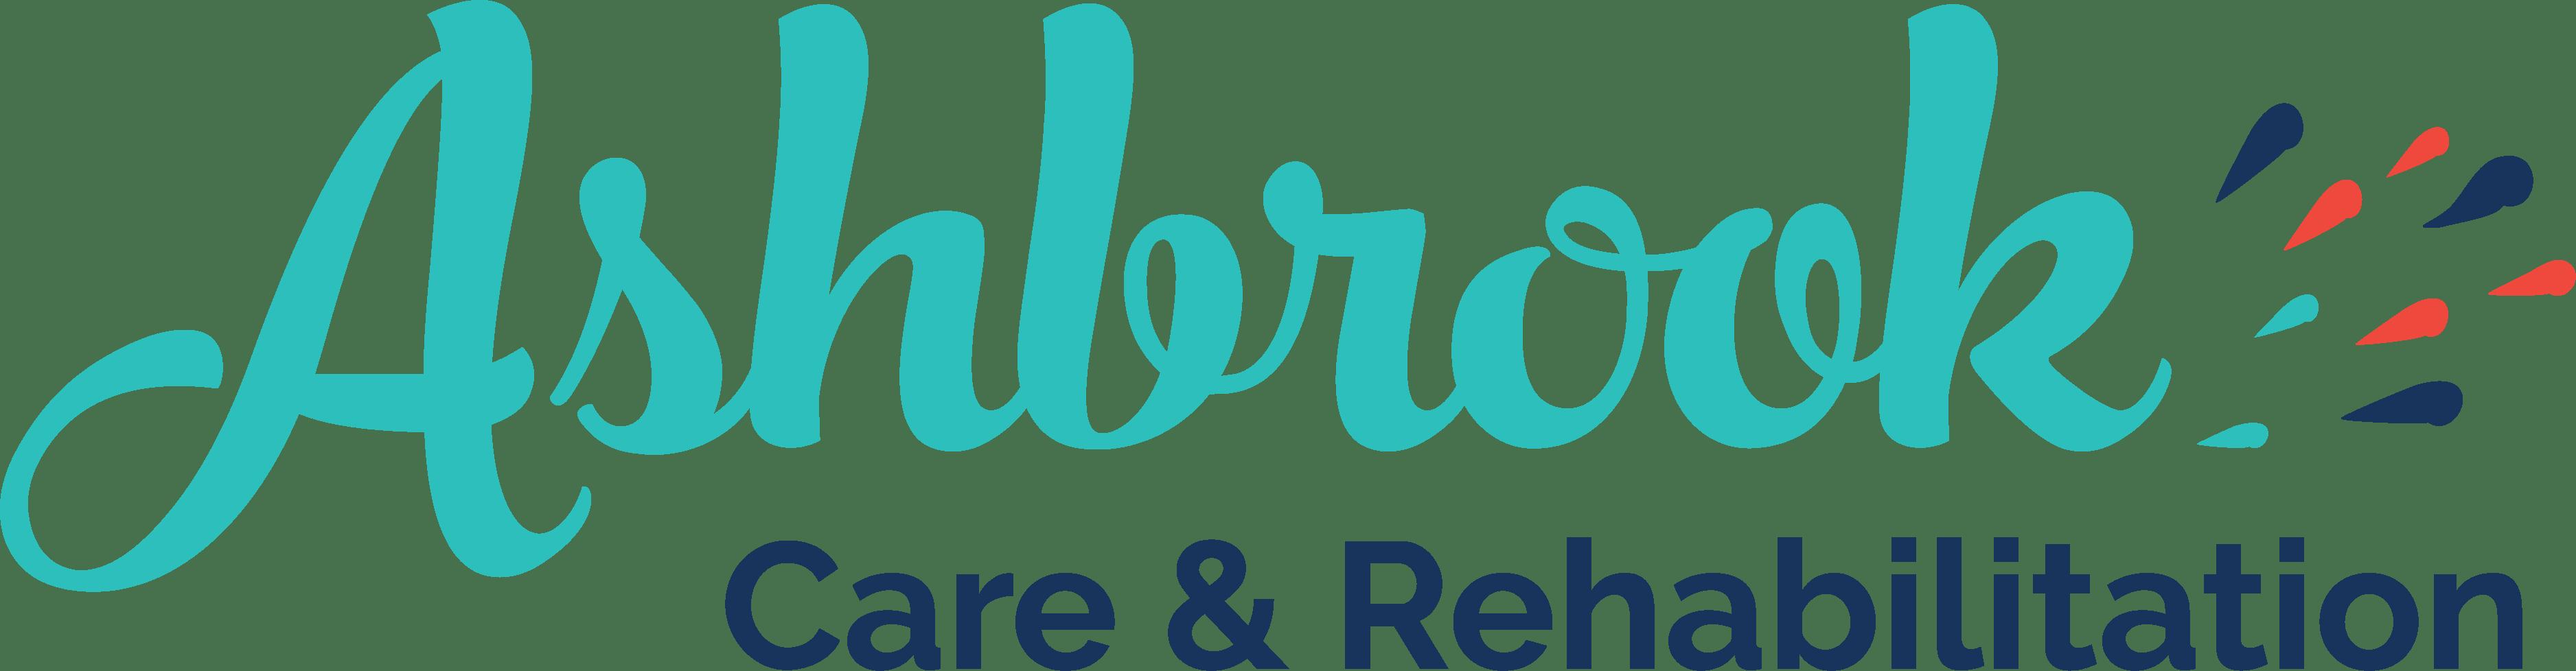 Logo: Ashbrook Care & Rehabilitation CCNJ Sponsor